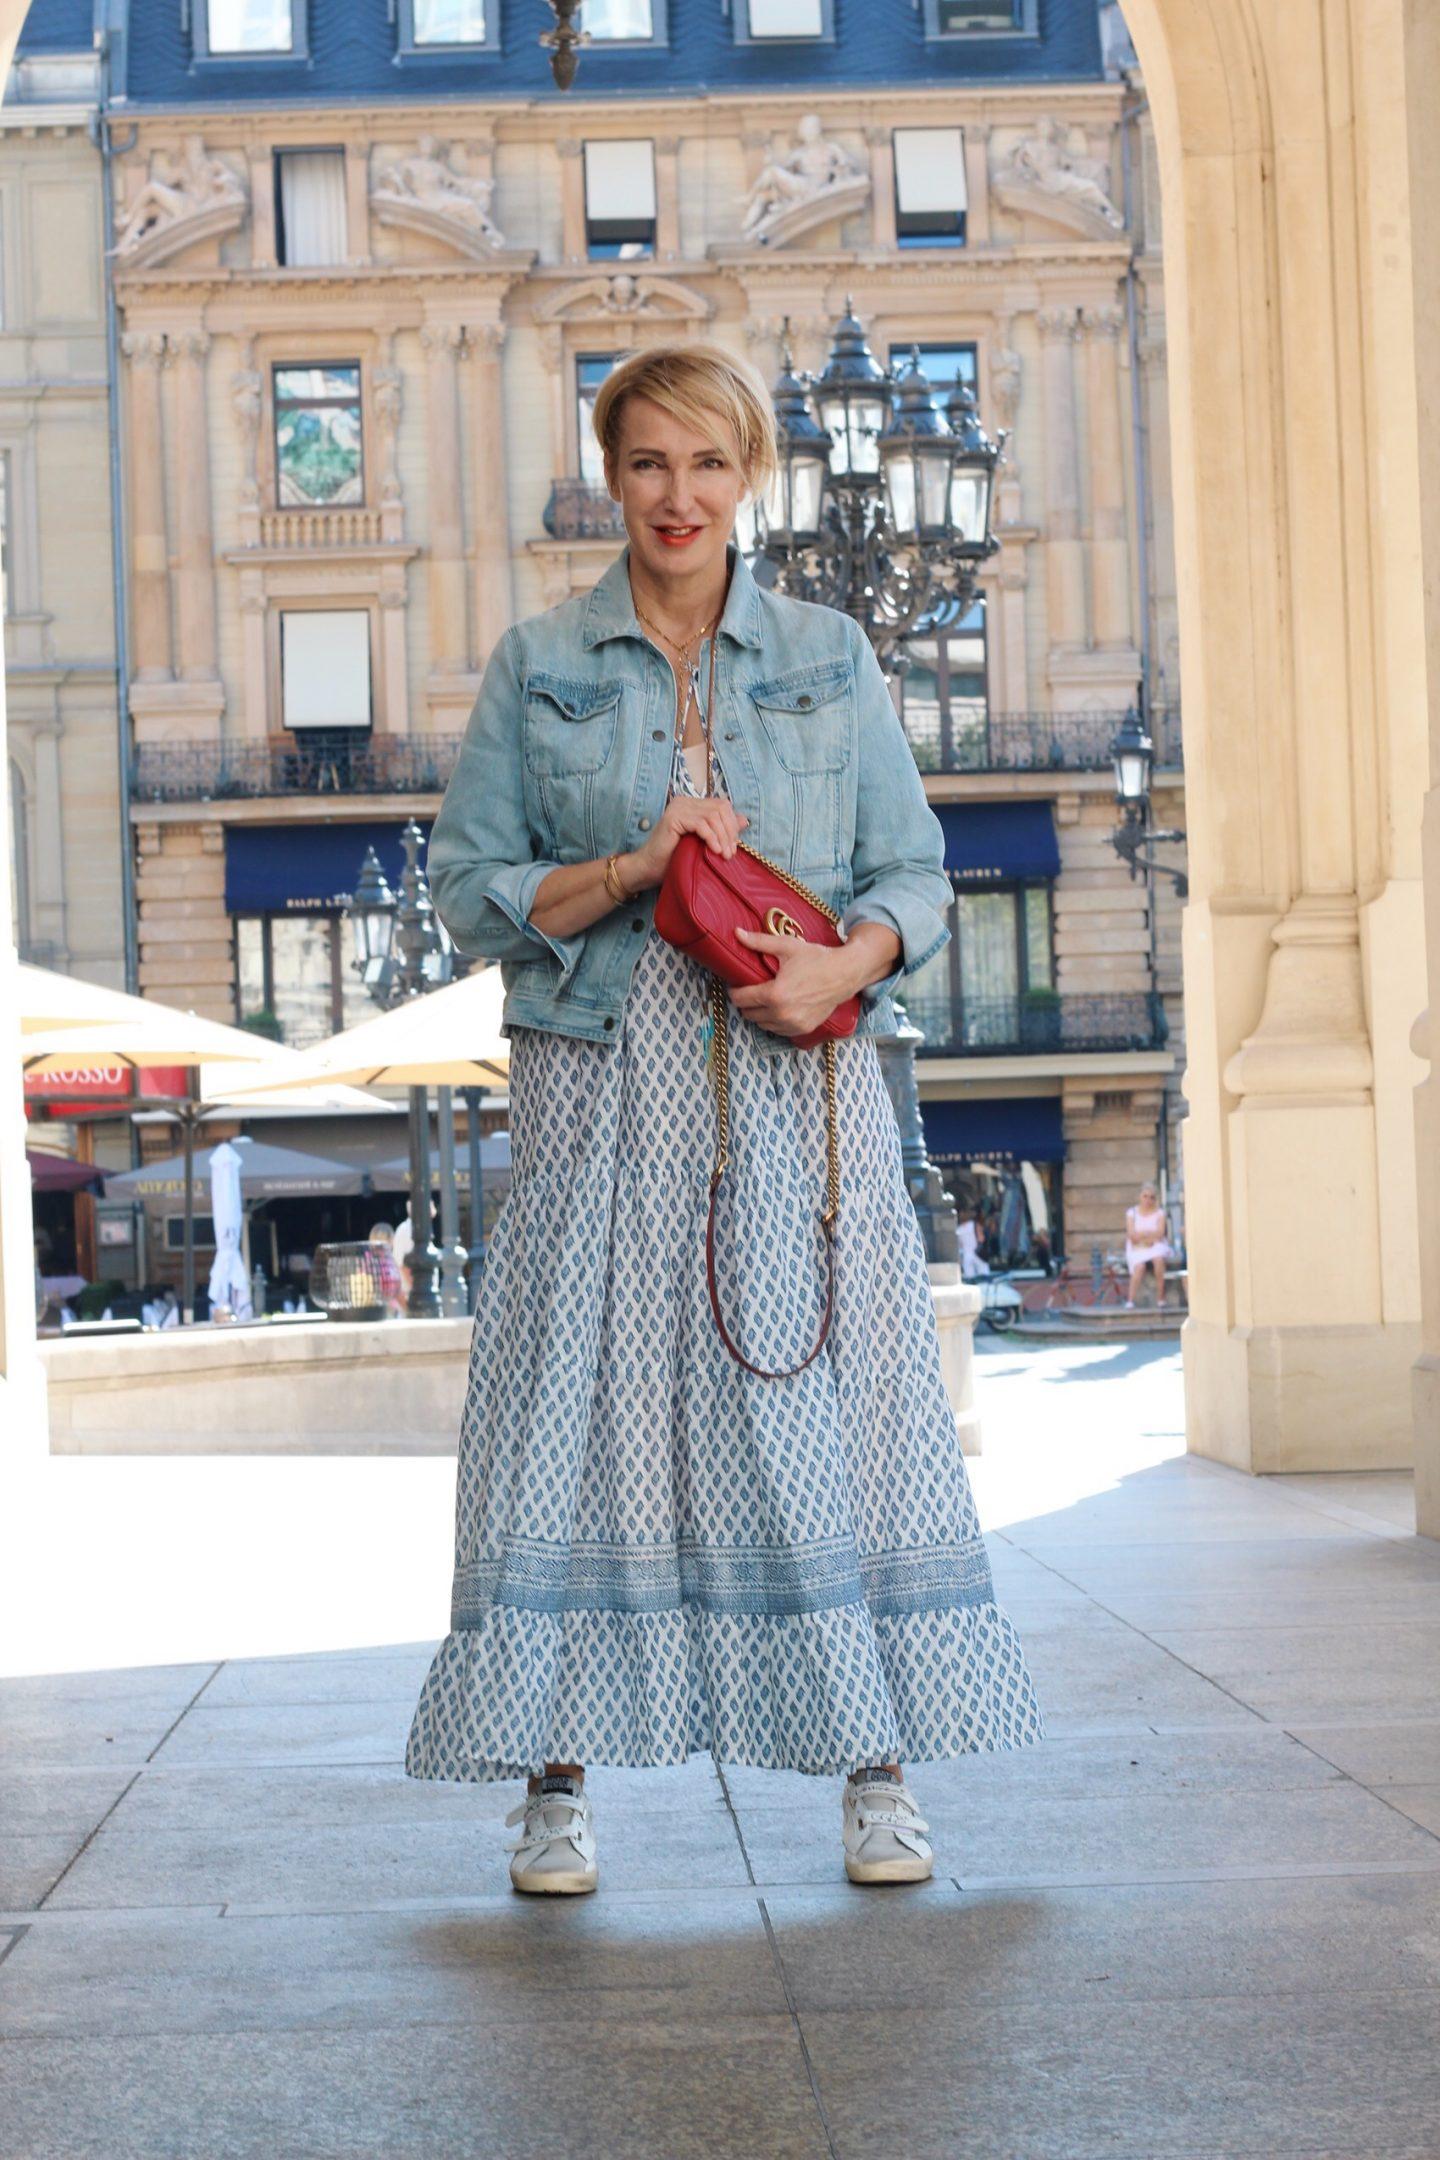 glamupyourlifestyle sommerkleider Herbst Boho-Style Boots ü-40-blog ü-50-blog ue-40-blog